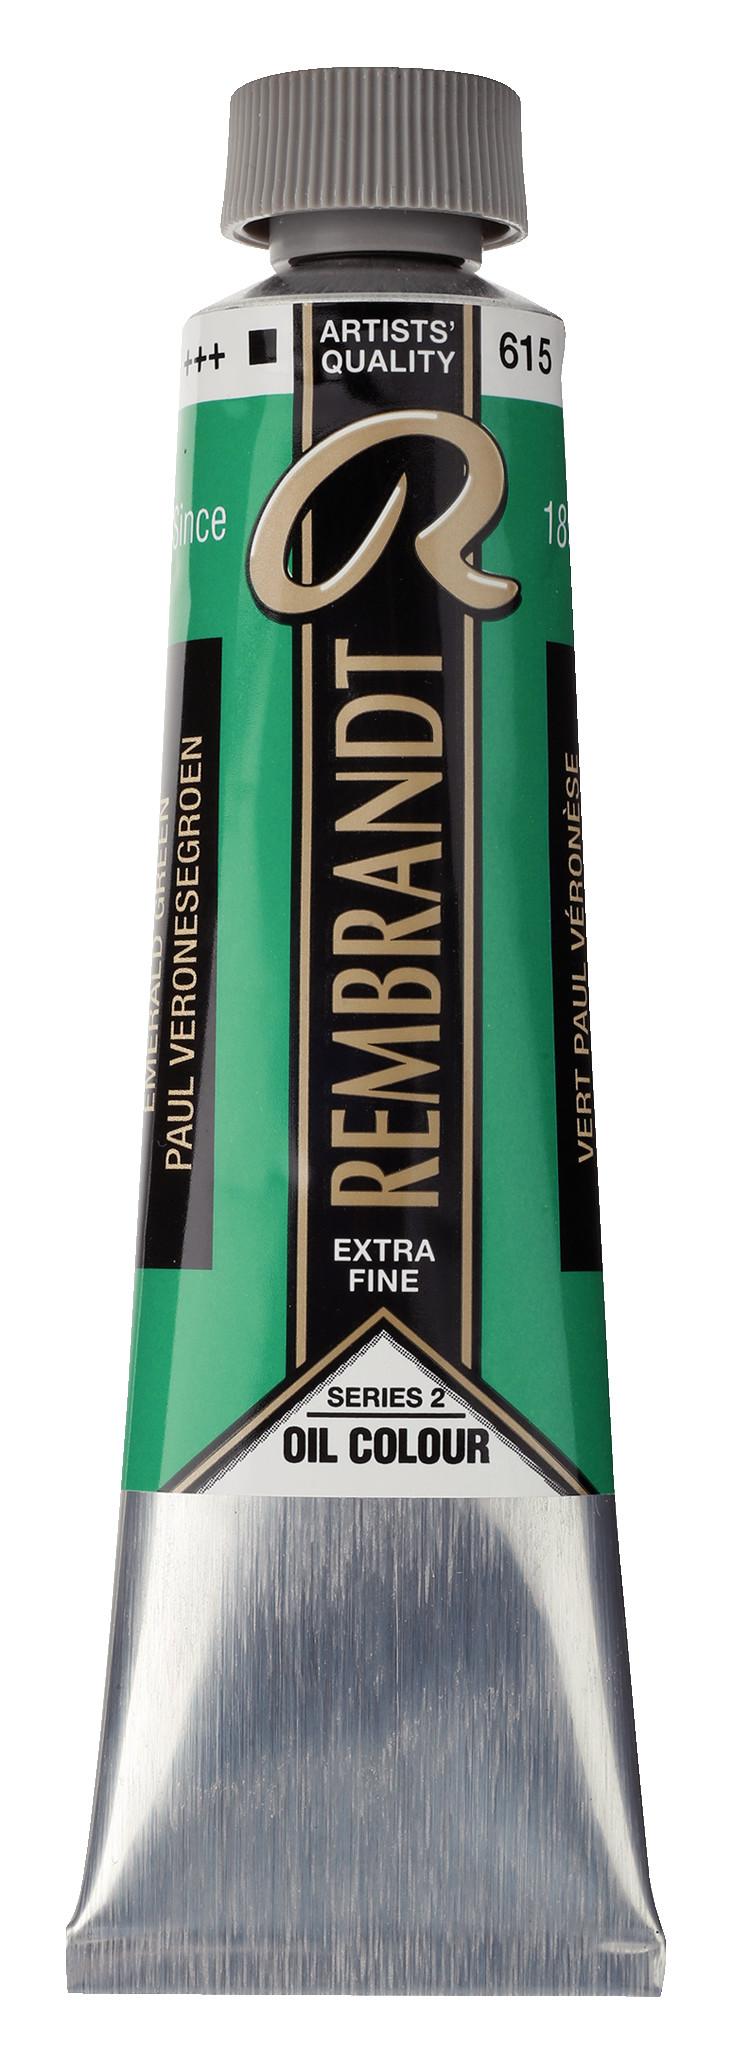 Rembrandt Oil colour Paint Emerald Green (615) 40ml Tube